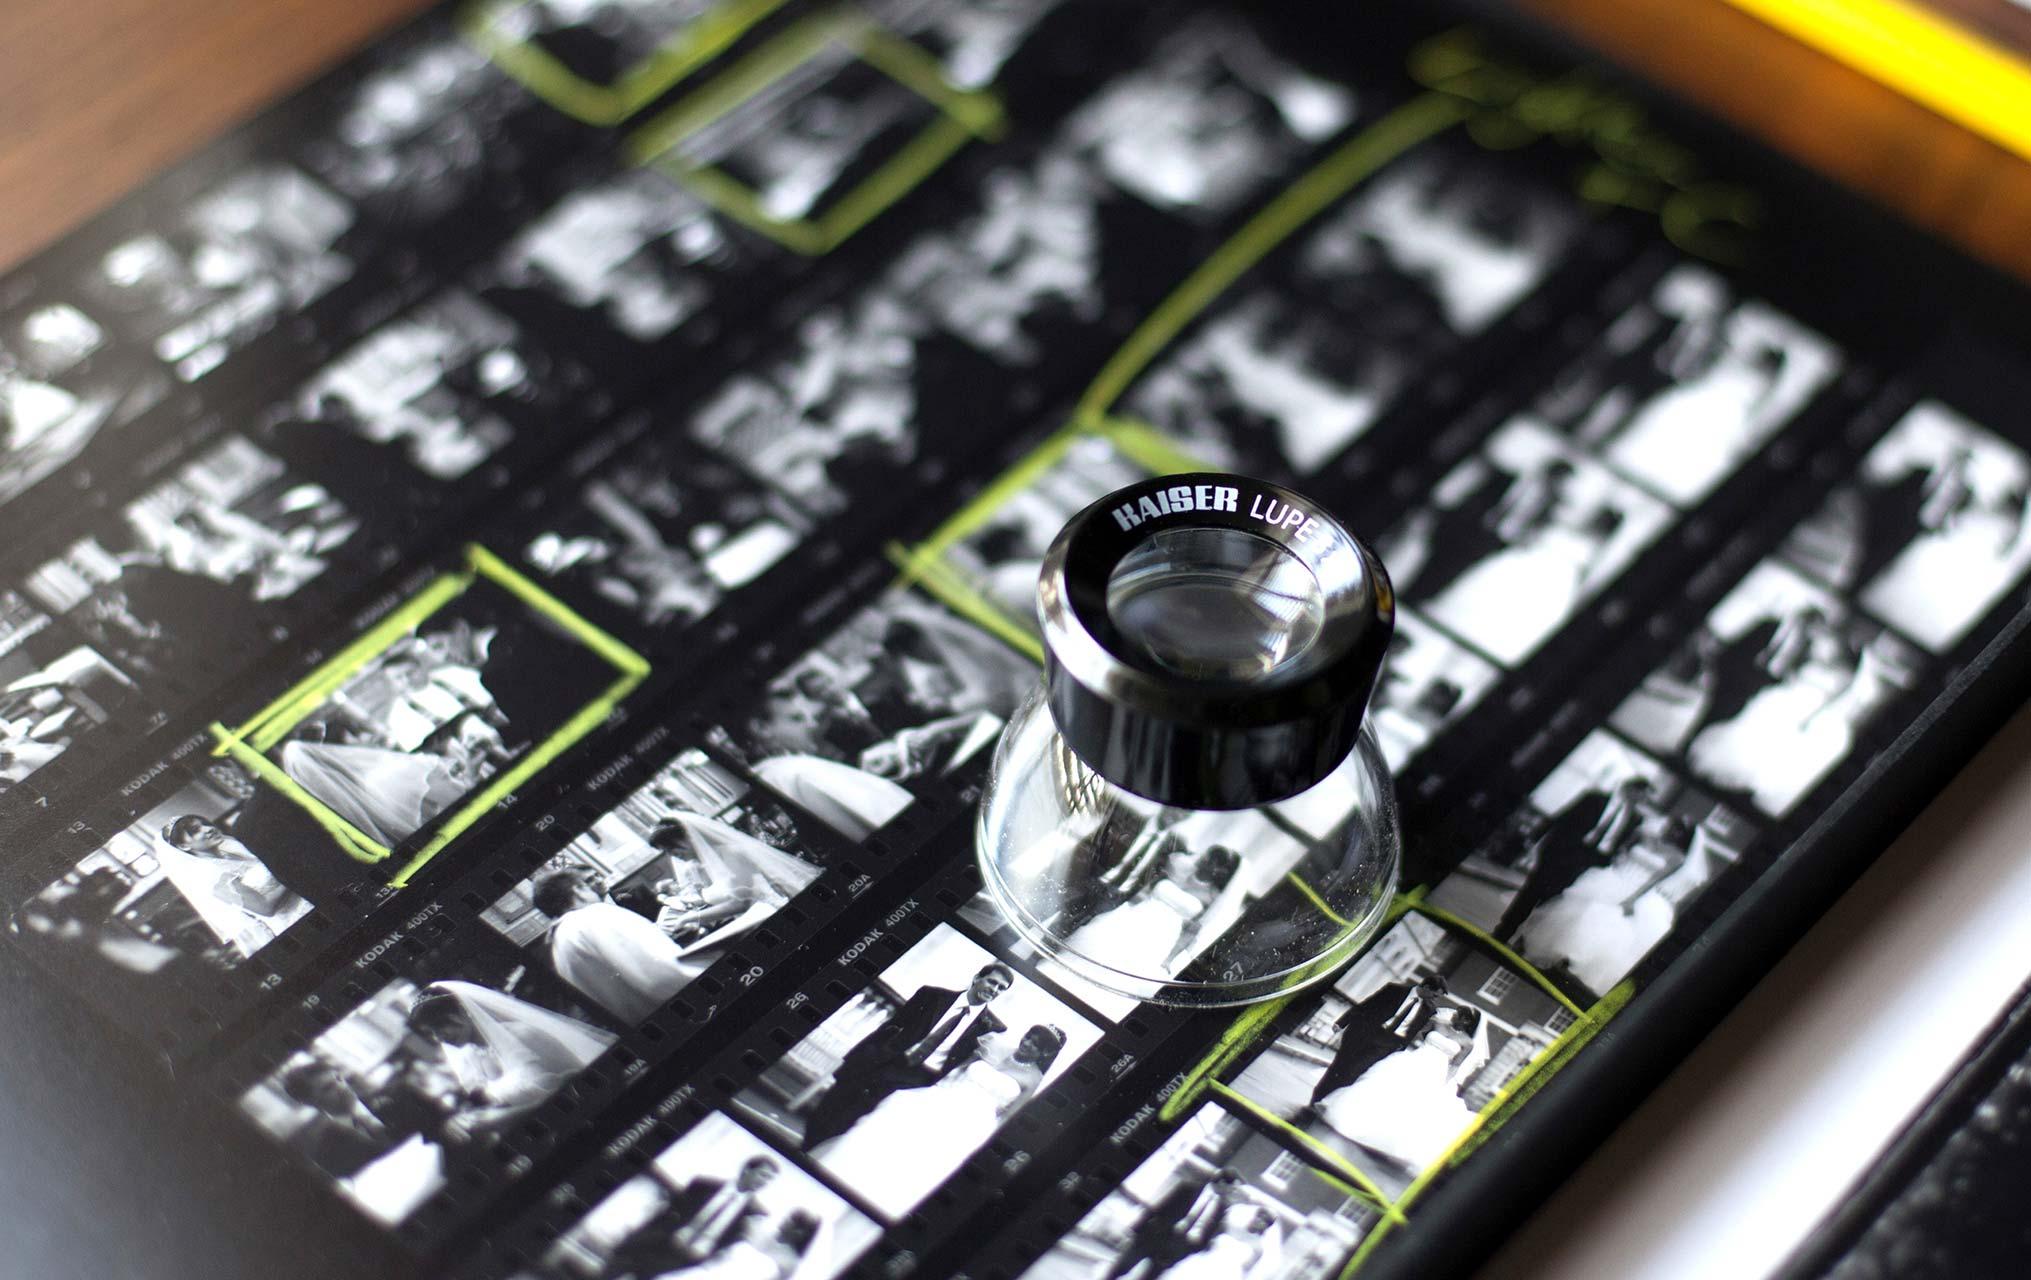 Richard Payne Memory Archive Box Lupe lens